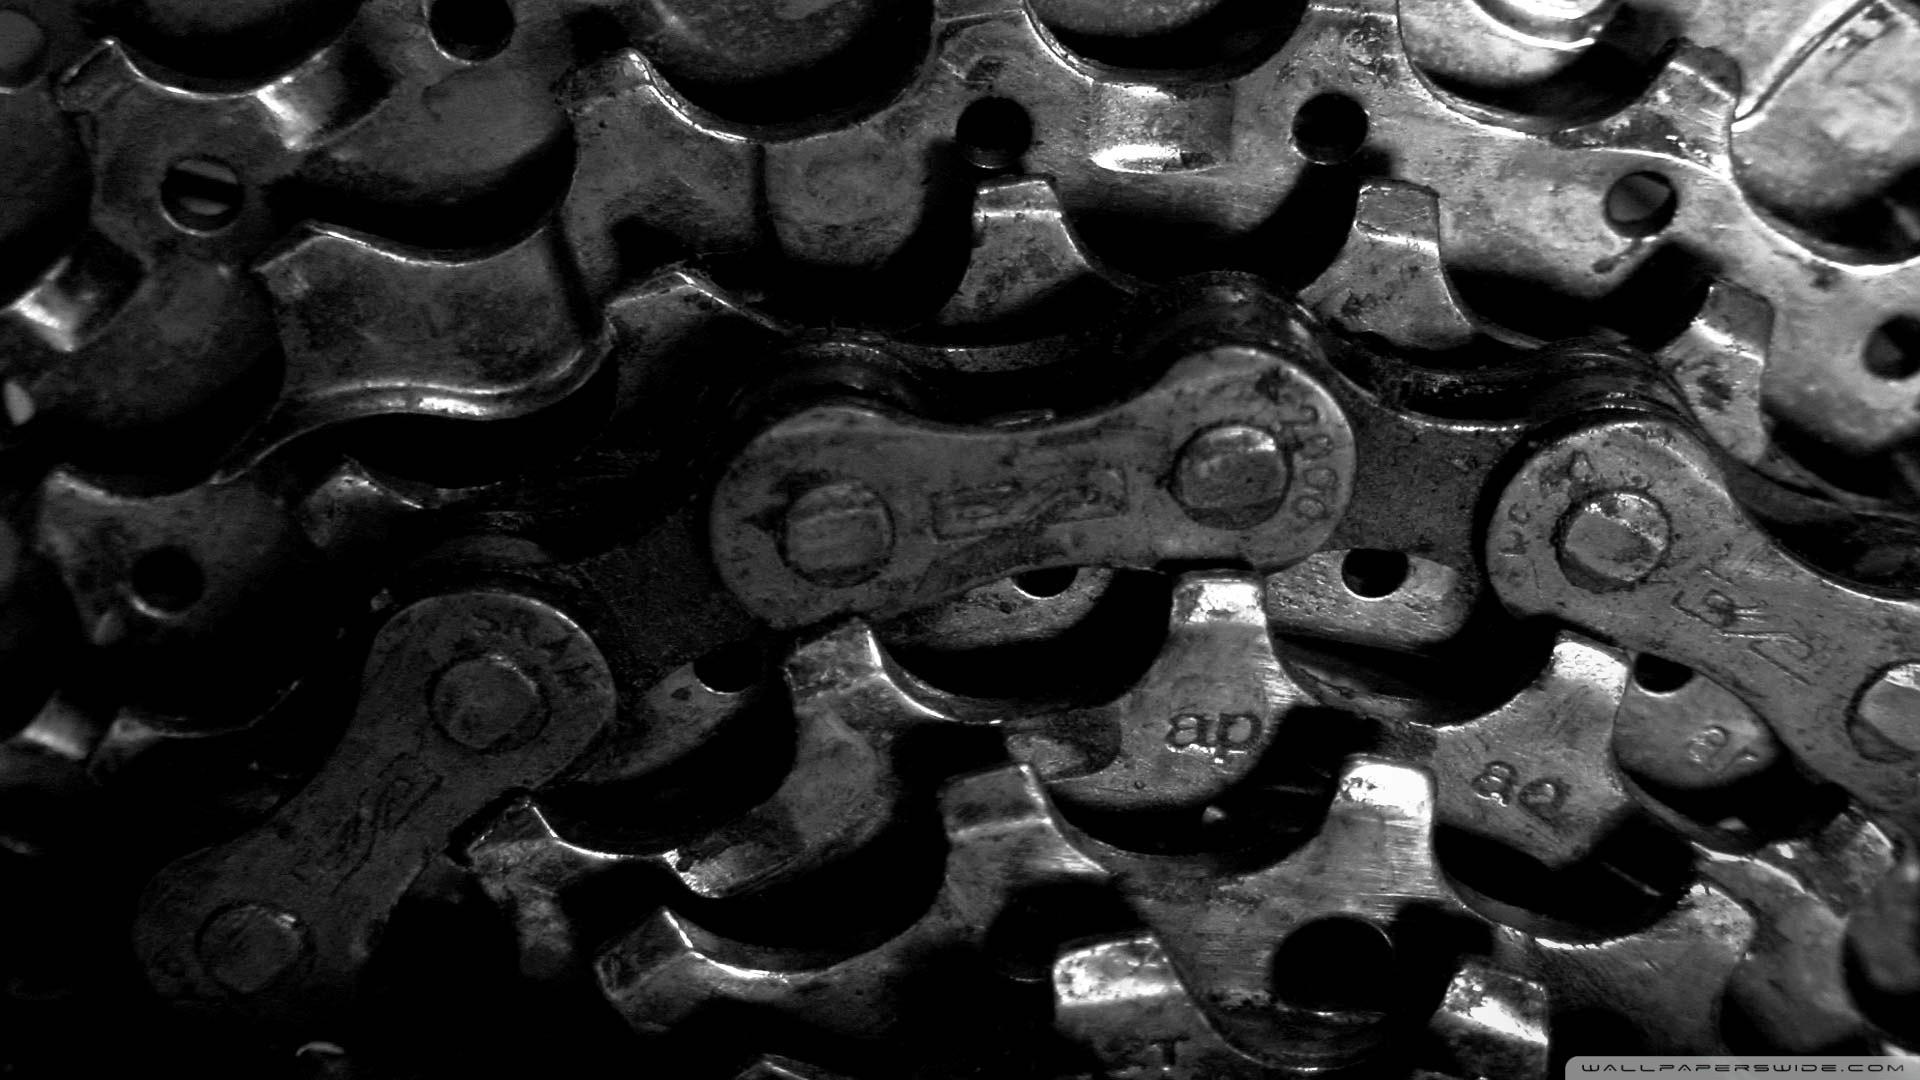 General 1920x1080 monochrome black background chains bicycle bicycle chain closeup macro gears machine dirt